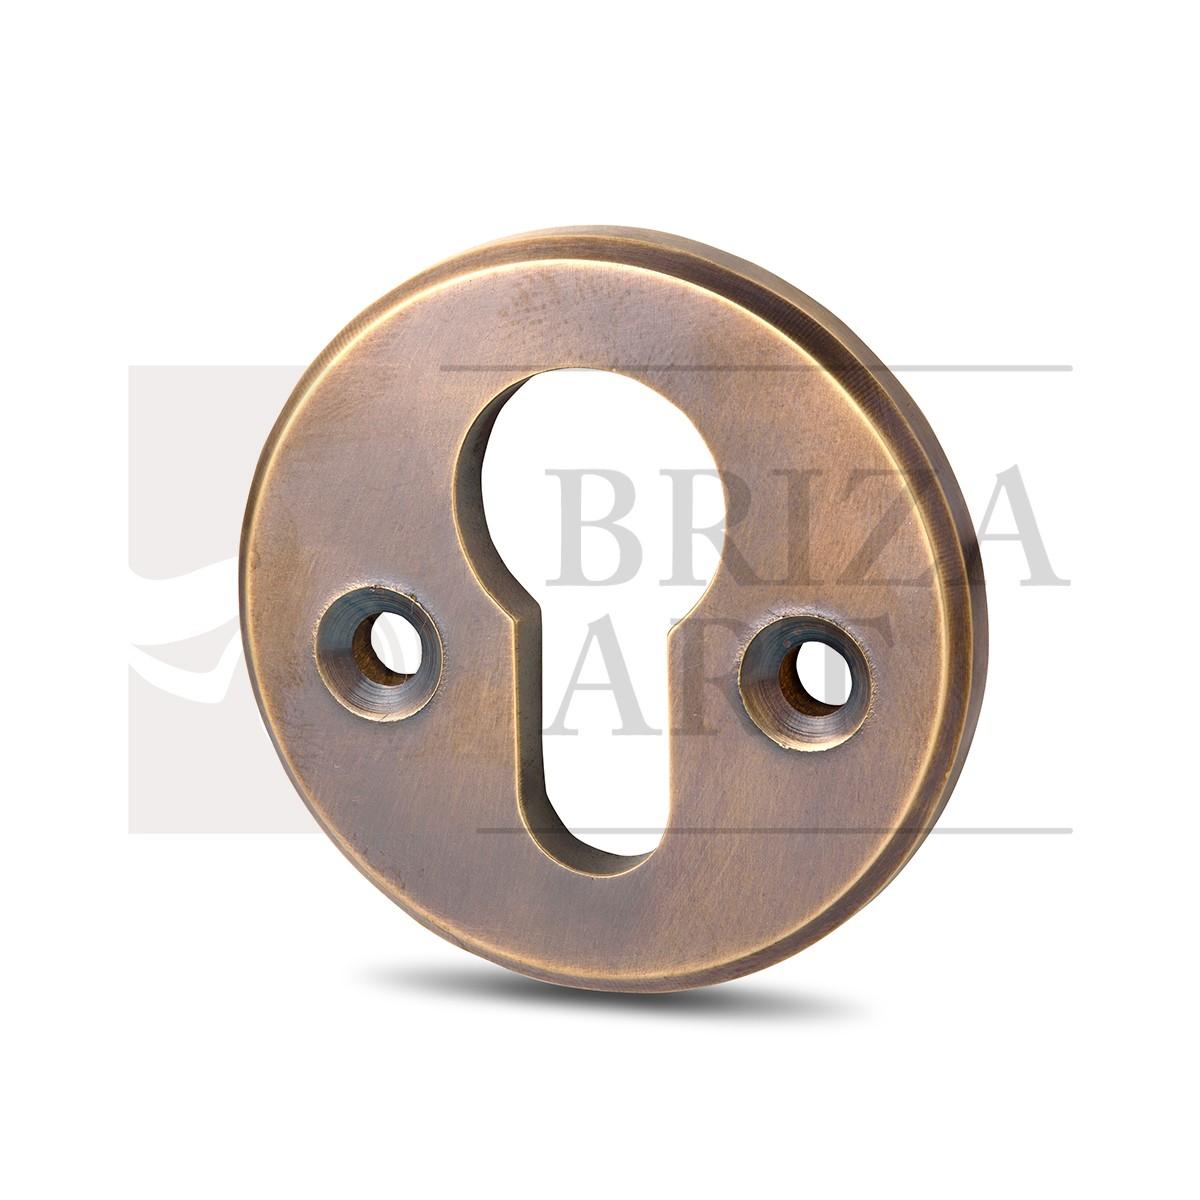 Ключевина круглая в патине, арт: 06-011